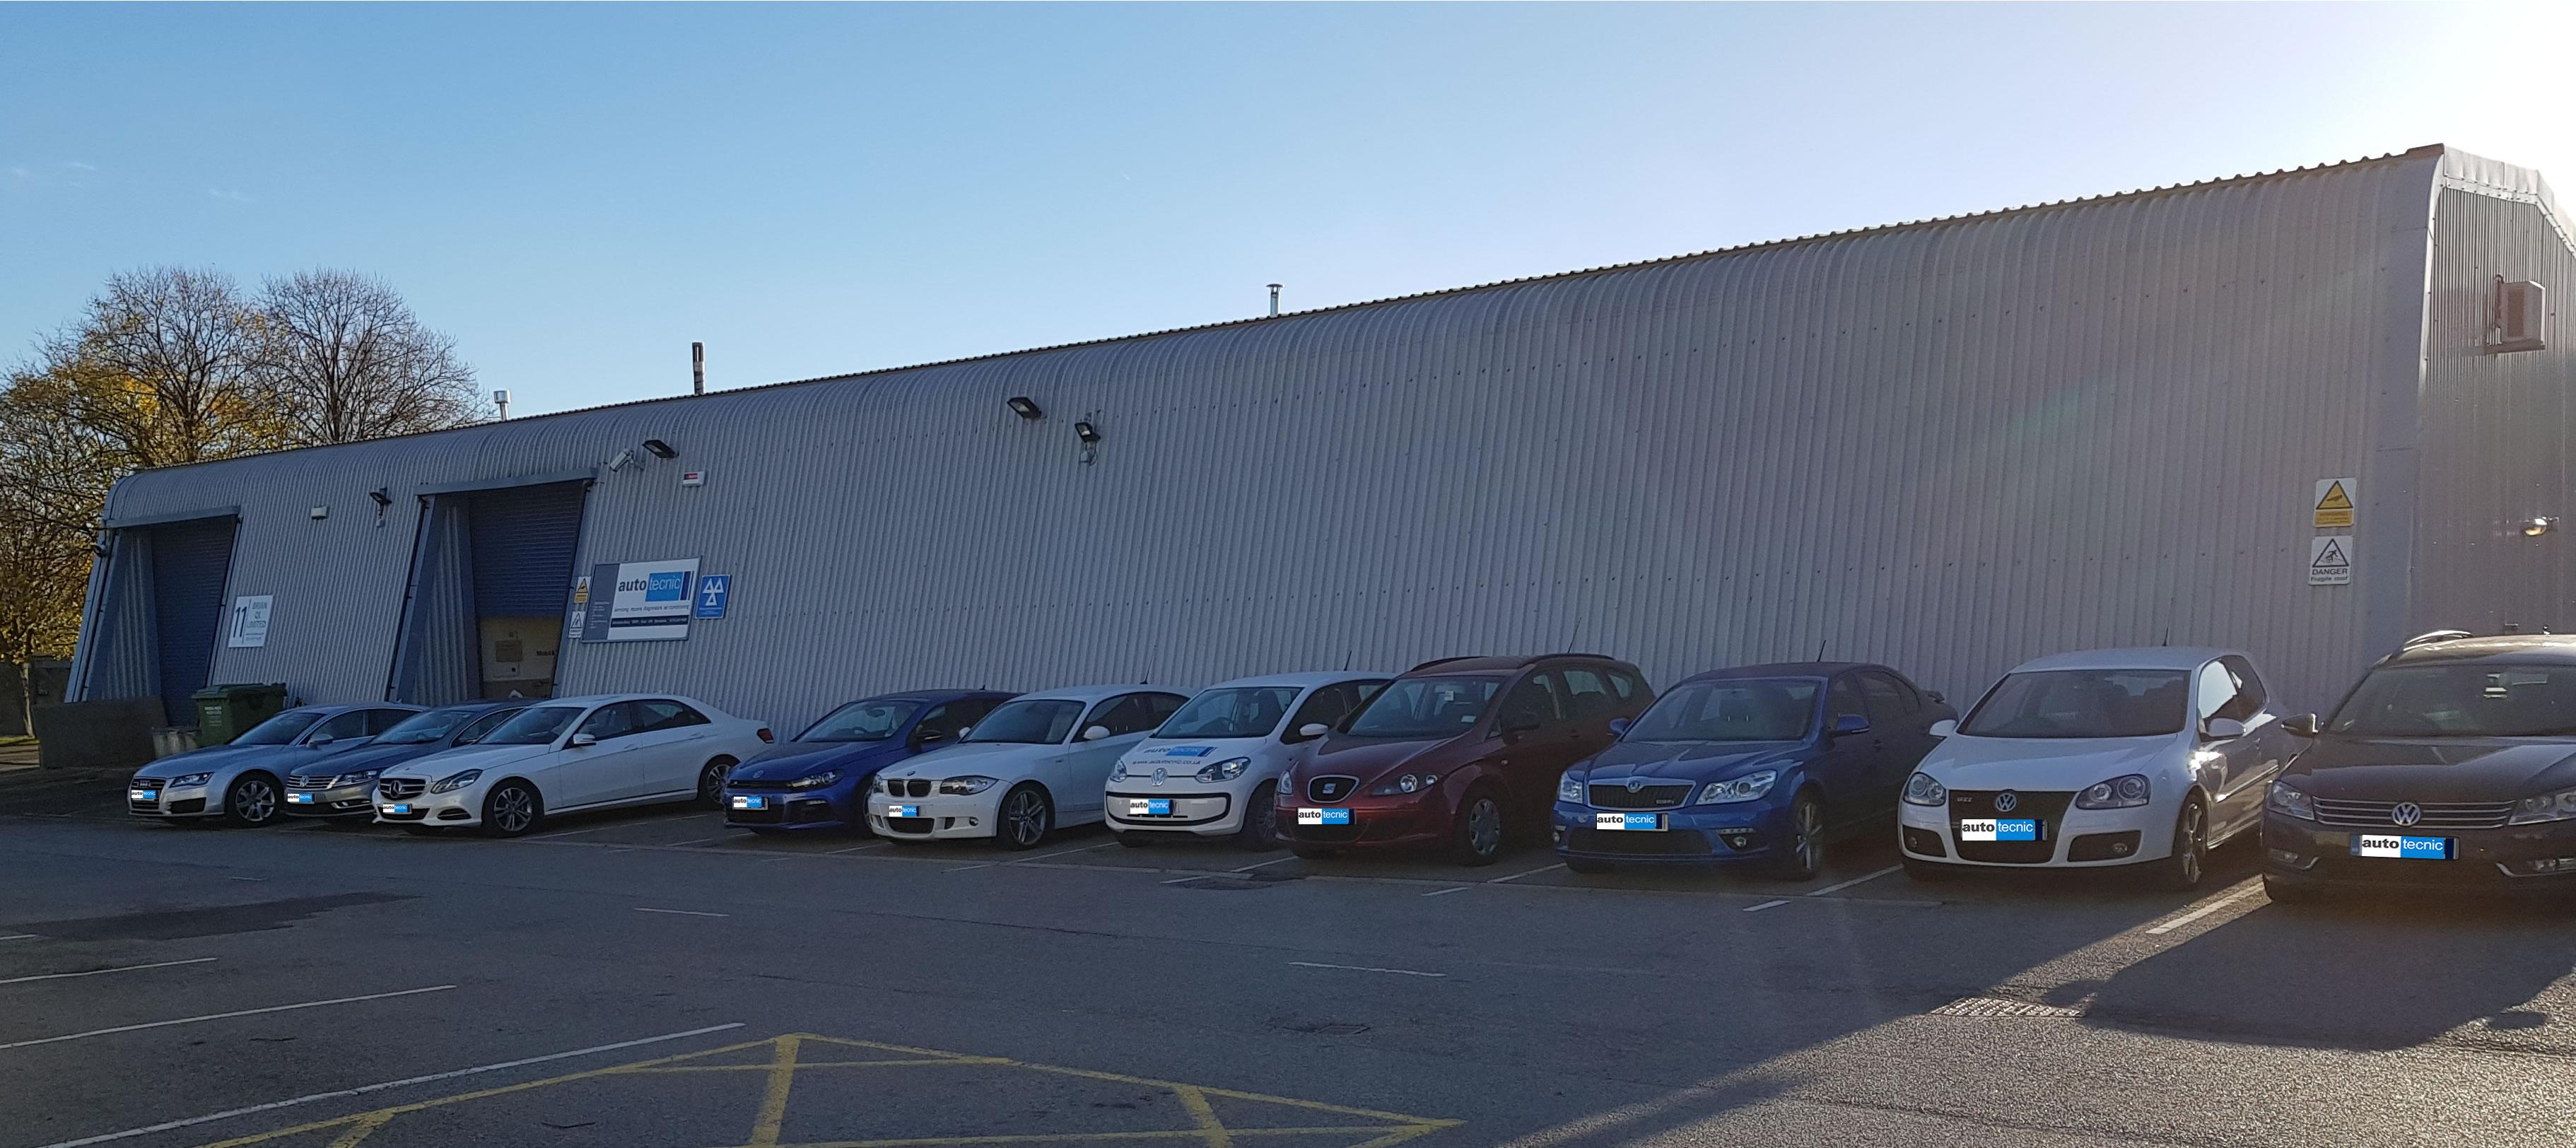 autotecnic - Garage - German Vehicles